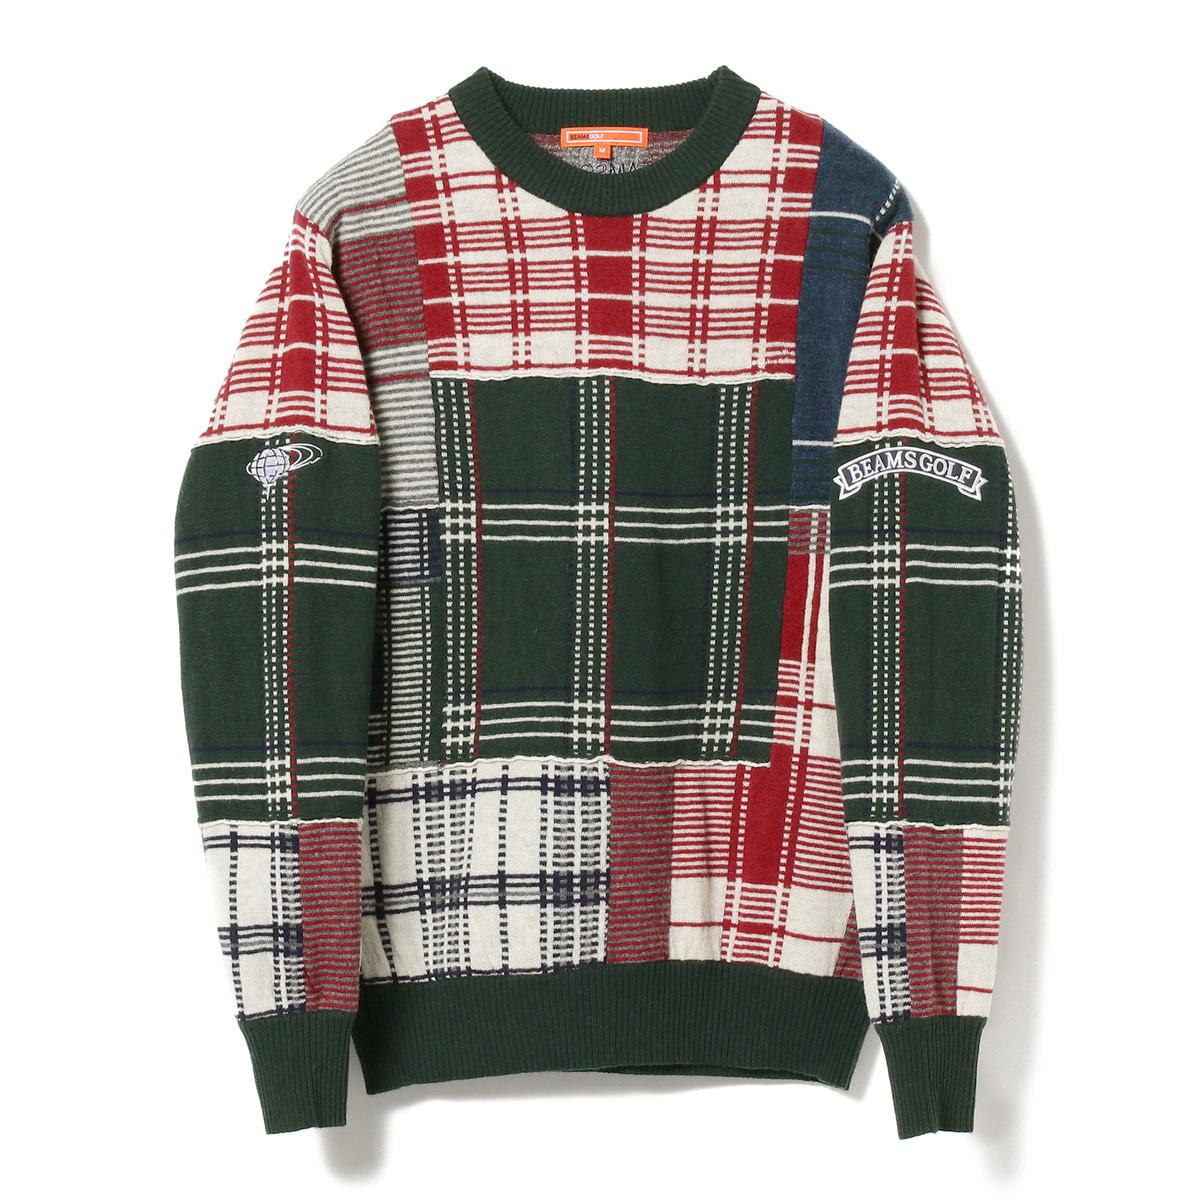 BEAMS GOLF ORANGE LABEL パッチワーク セーター